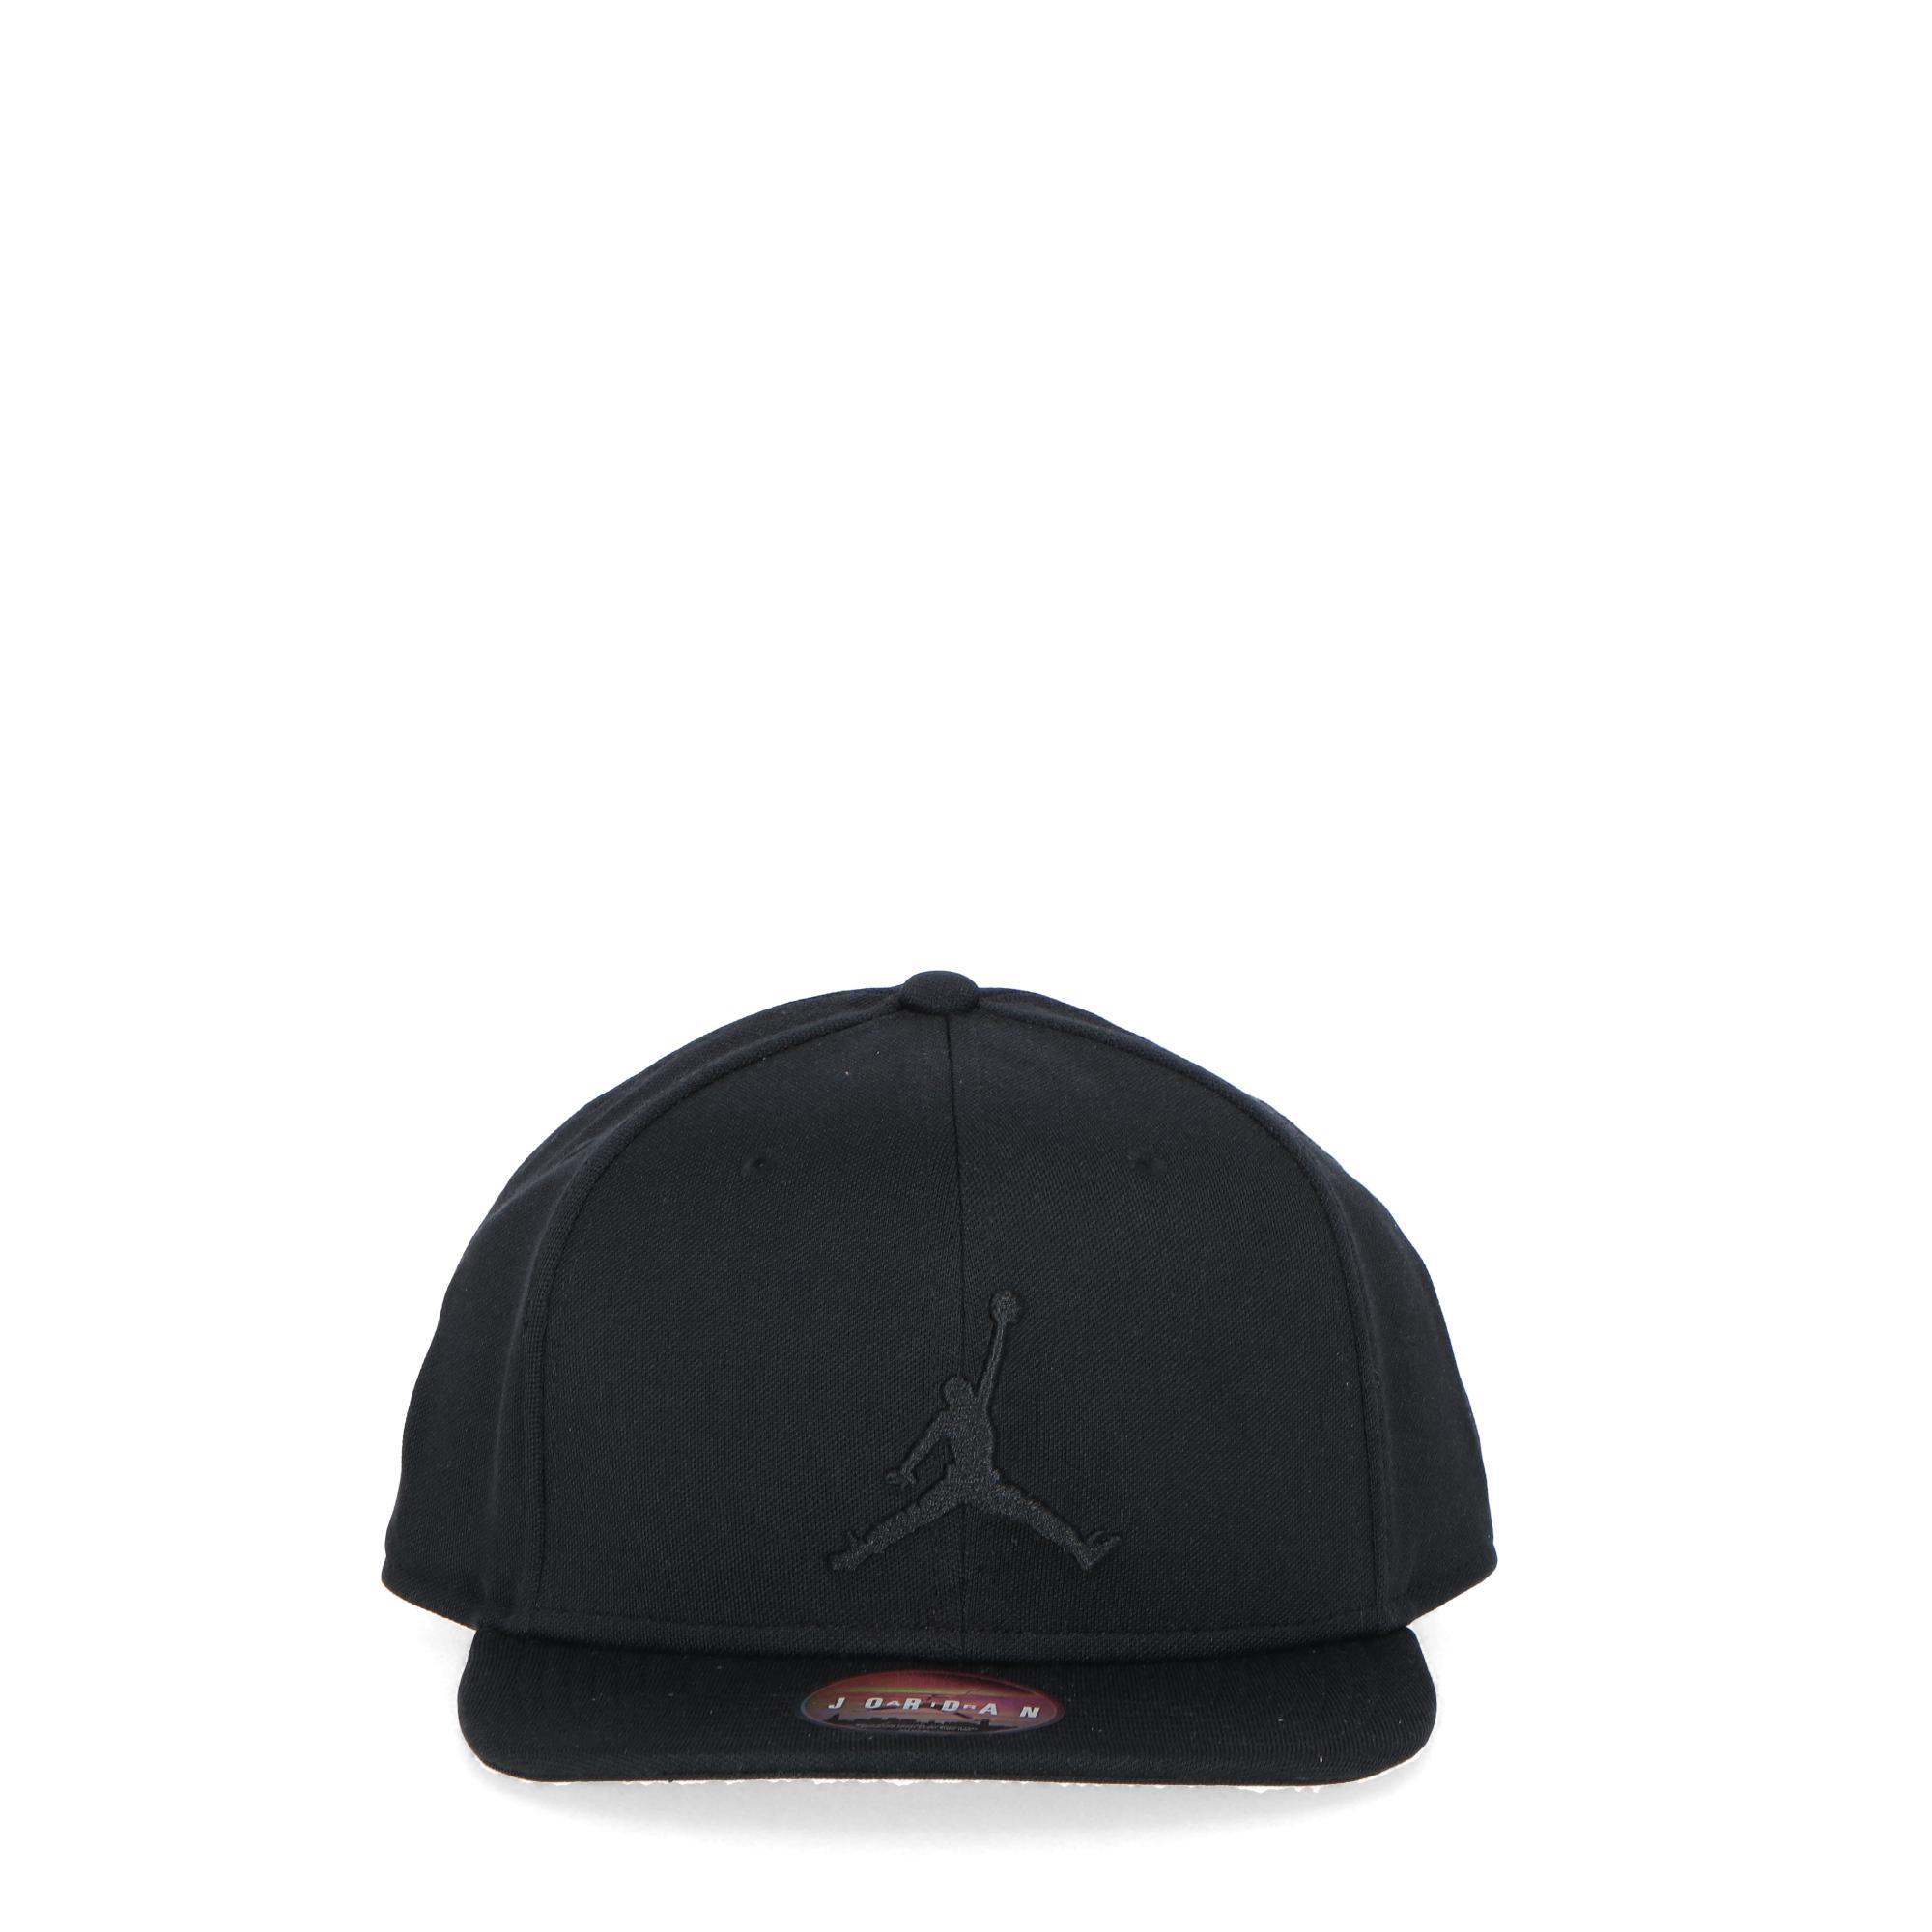 93606c1763c Nike Jordan Jumpman Snapback Black Black